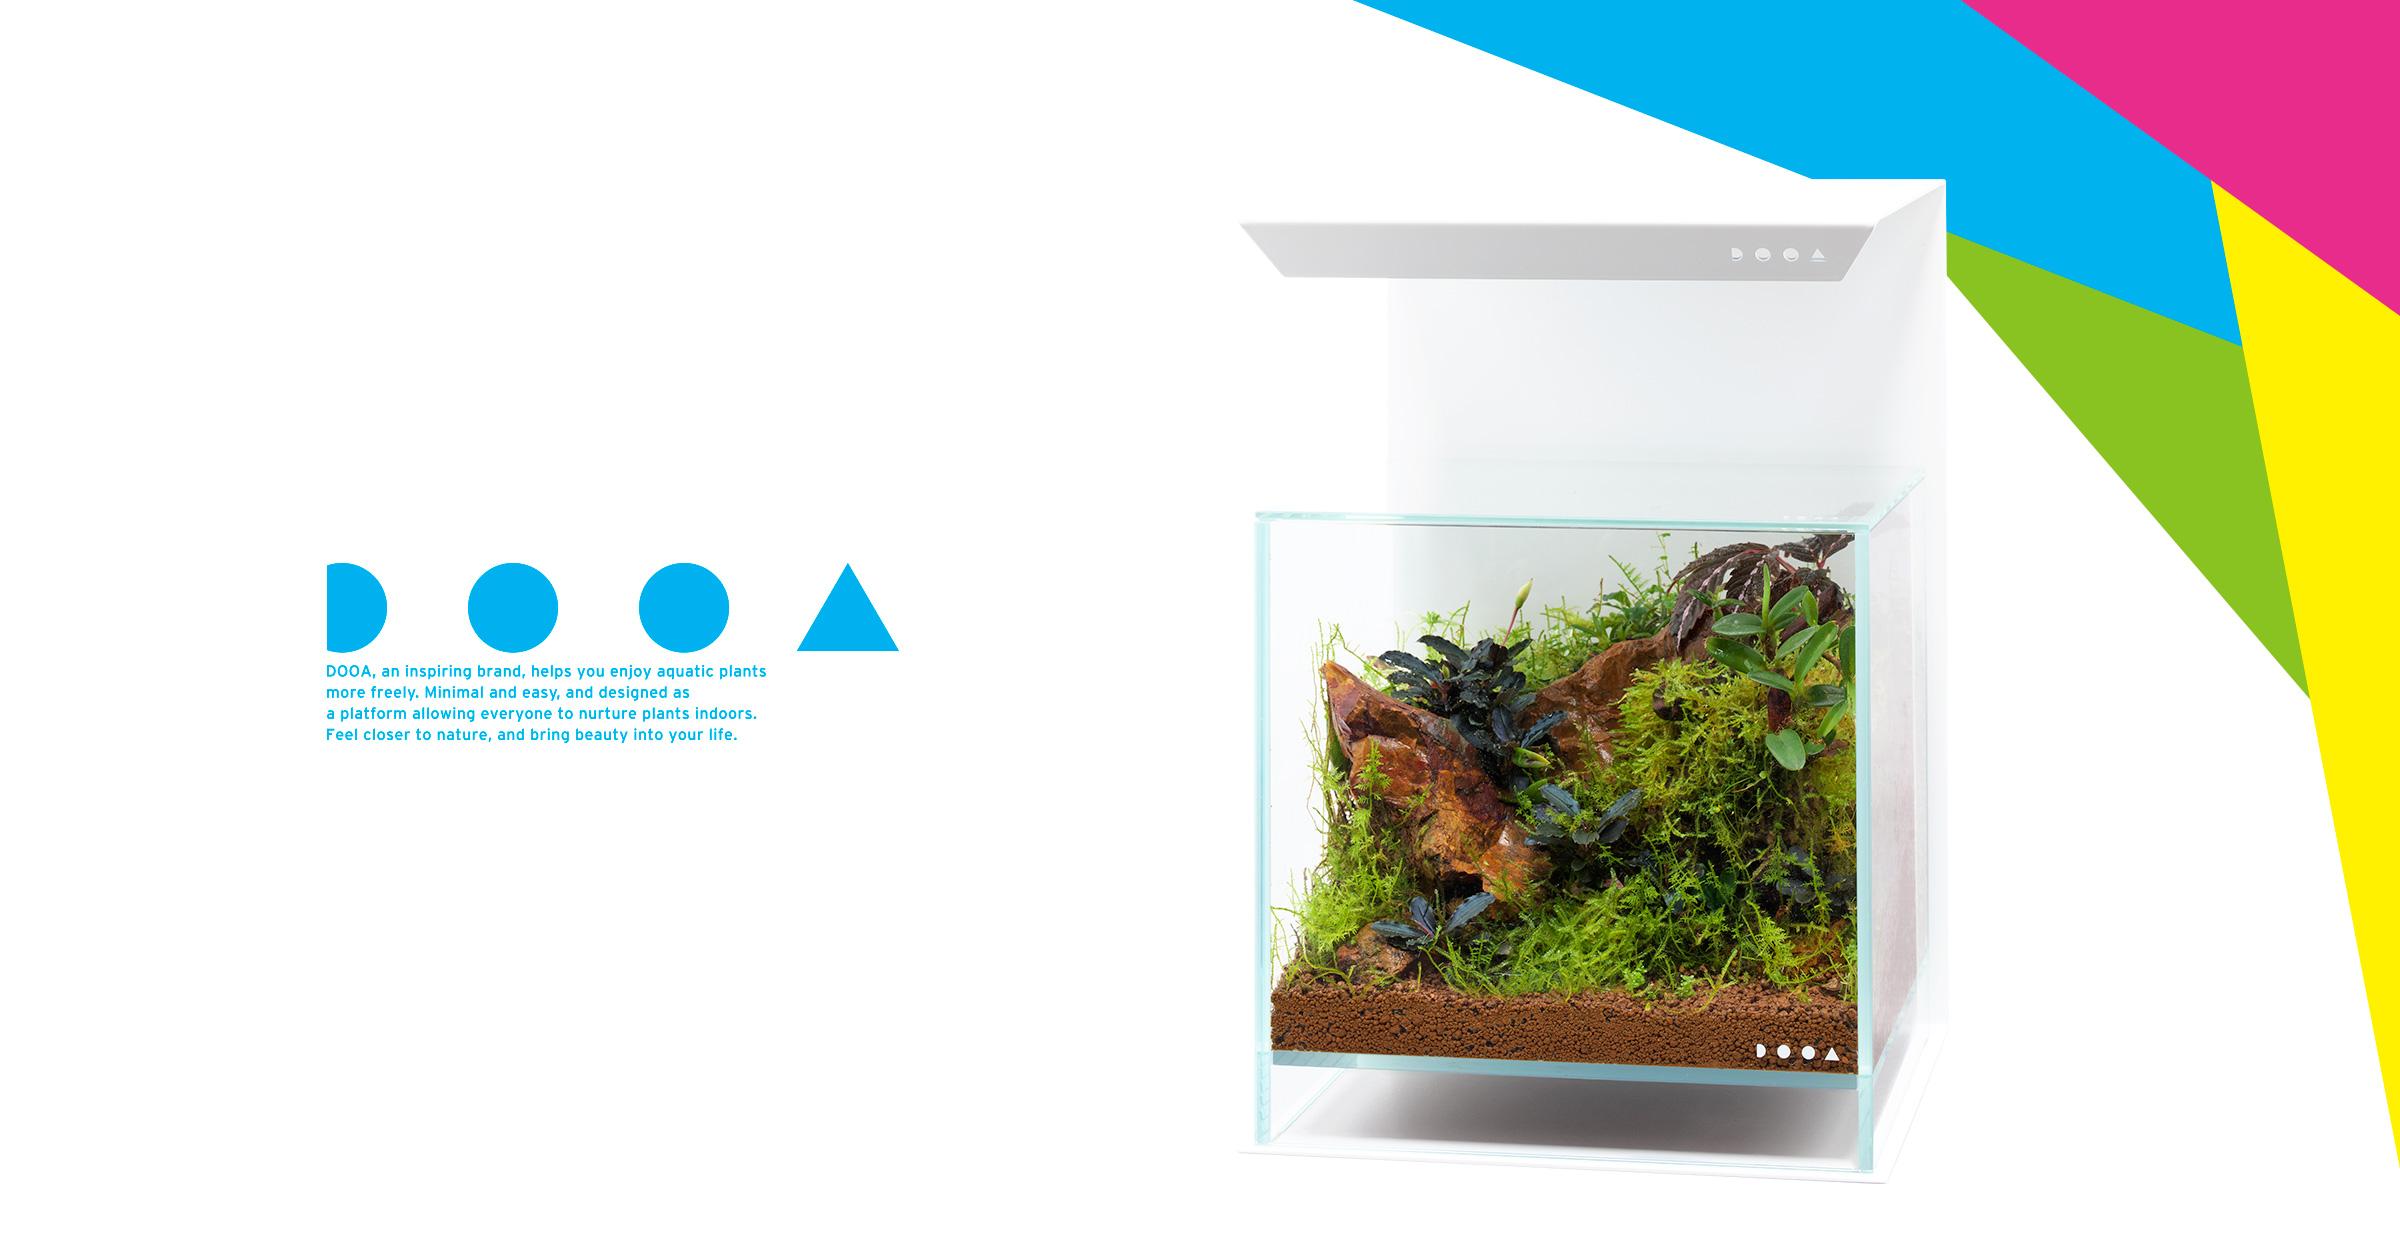 DOOA PALUDARIUM 「熱帯植物の自生環境に思いを馳せて」